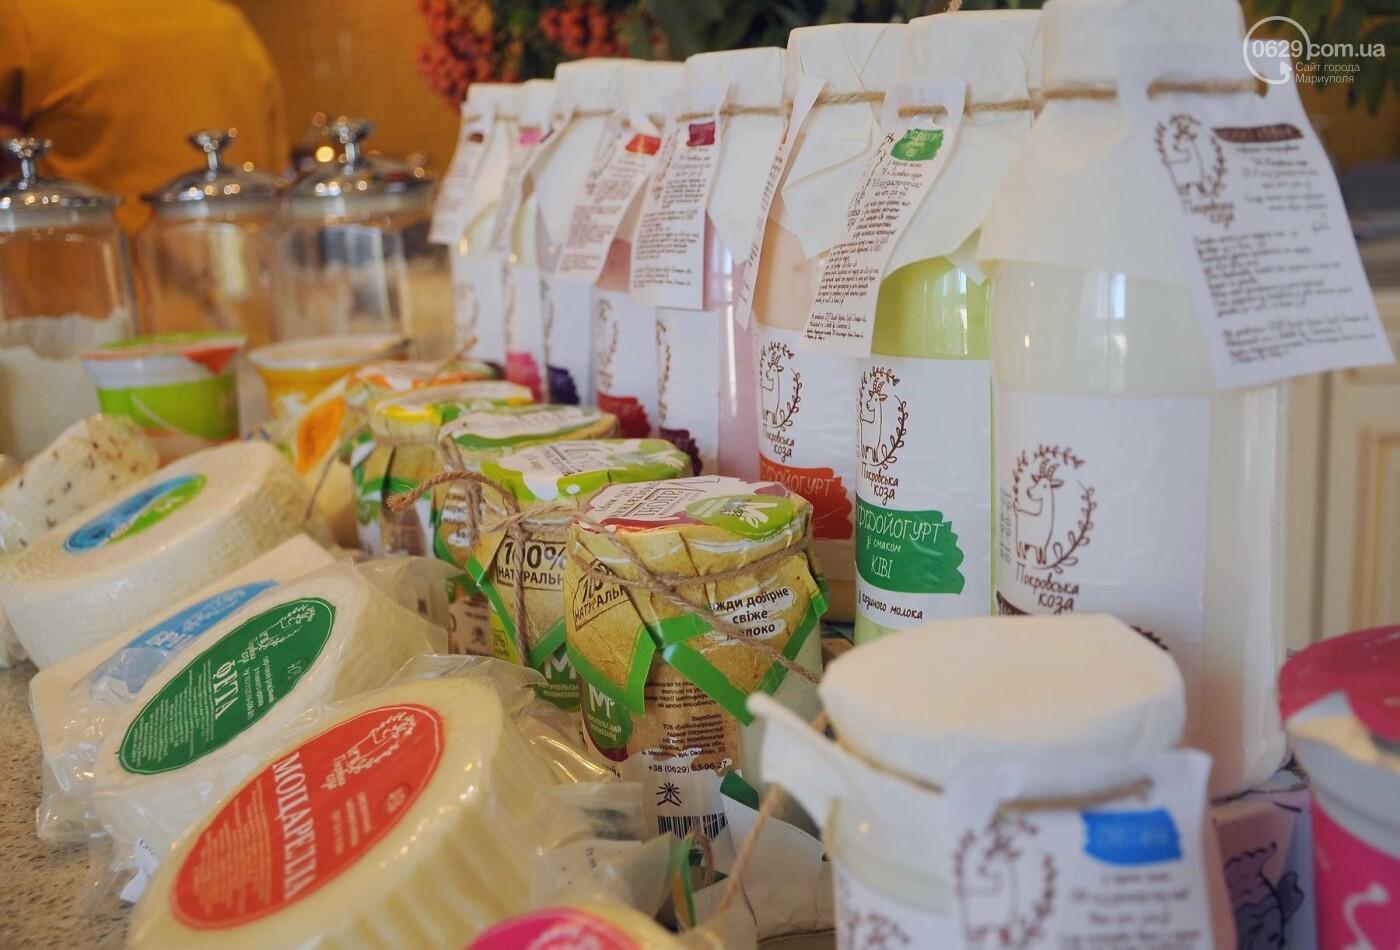 Мариупольский молокозавод дарит 1000 гривен, фото-5